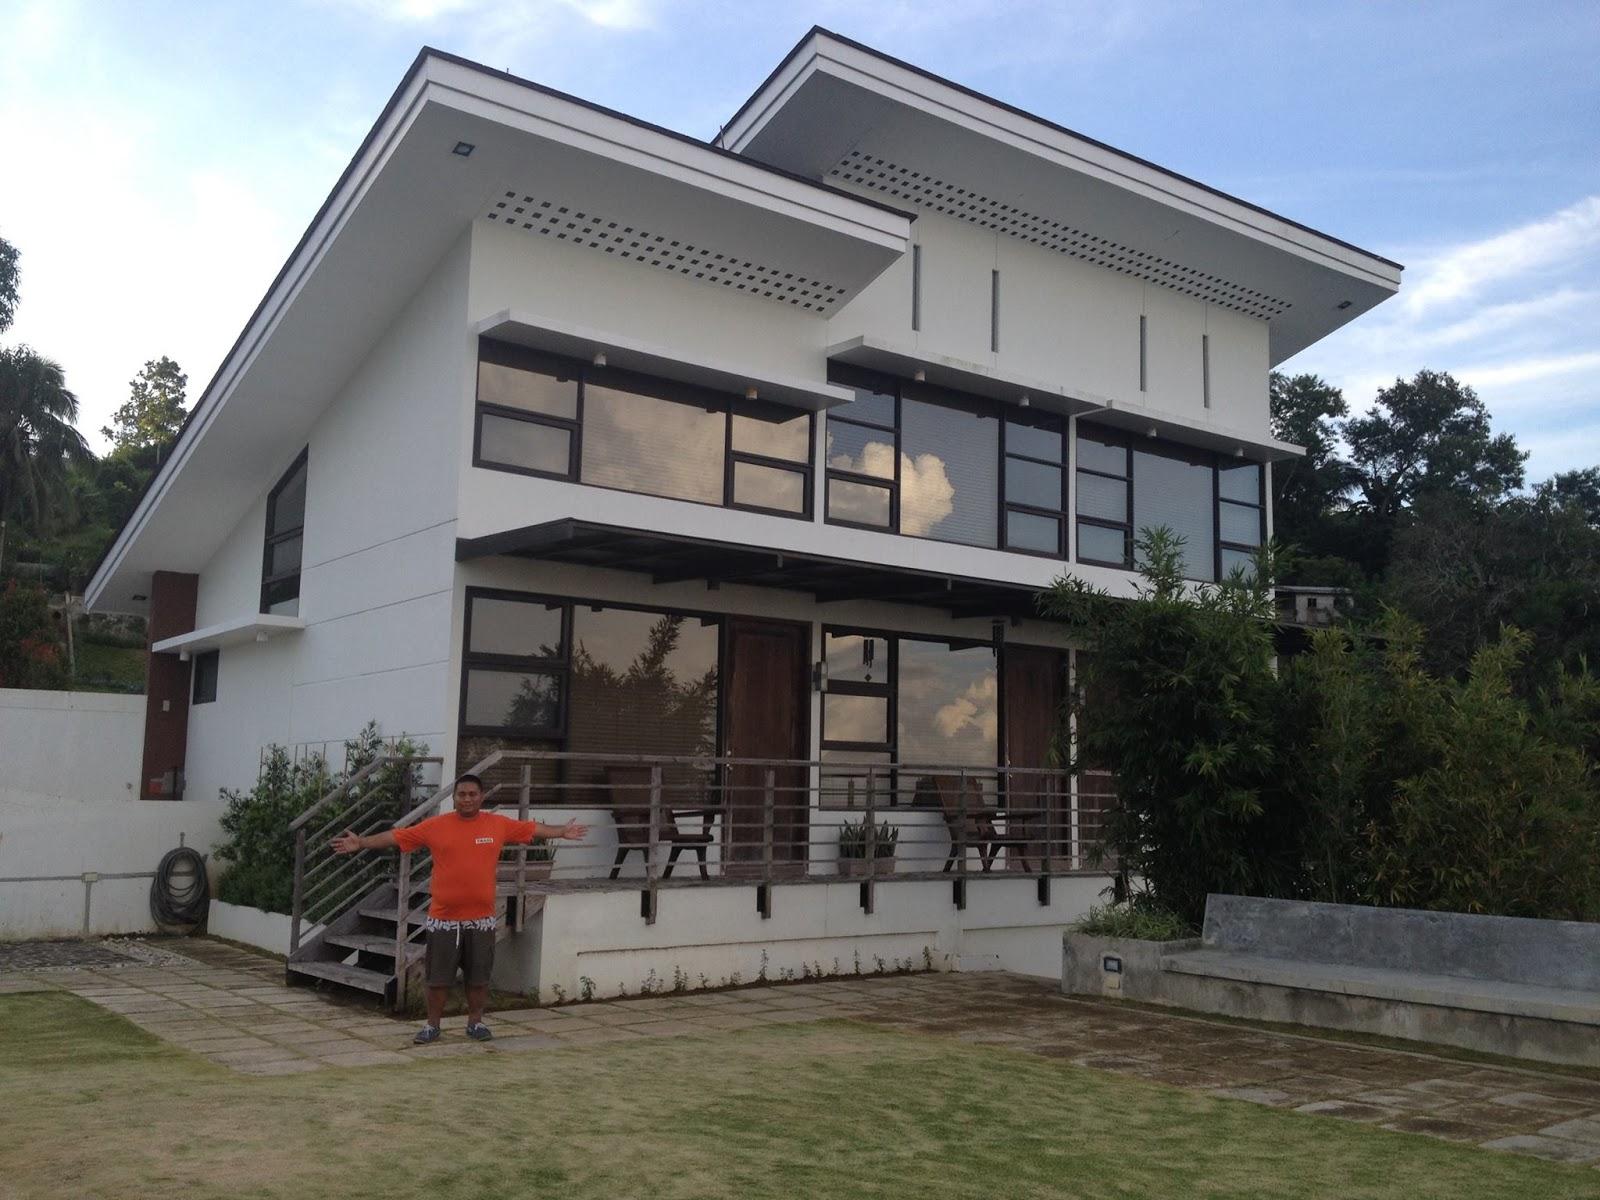 Team Building Venues In Cebu Philippines We Have Conducted Programs At Cebu Teambuilding